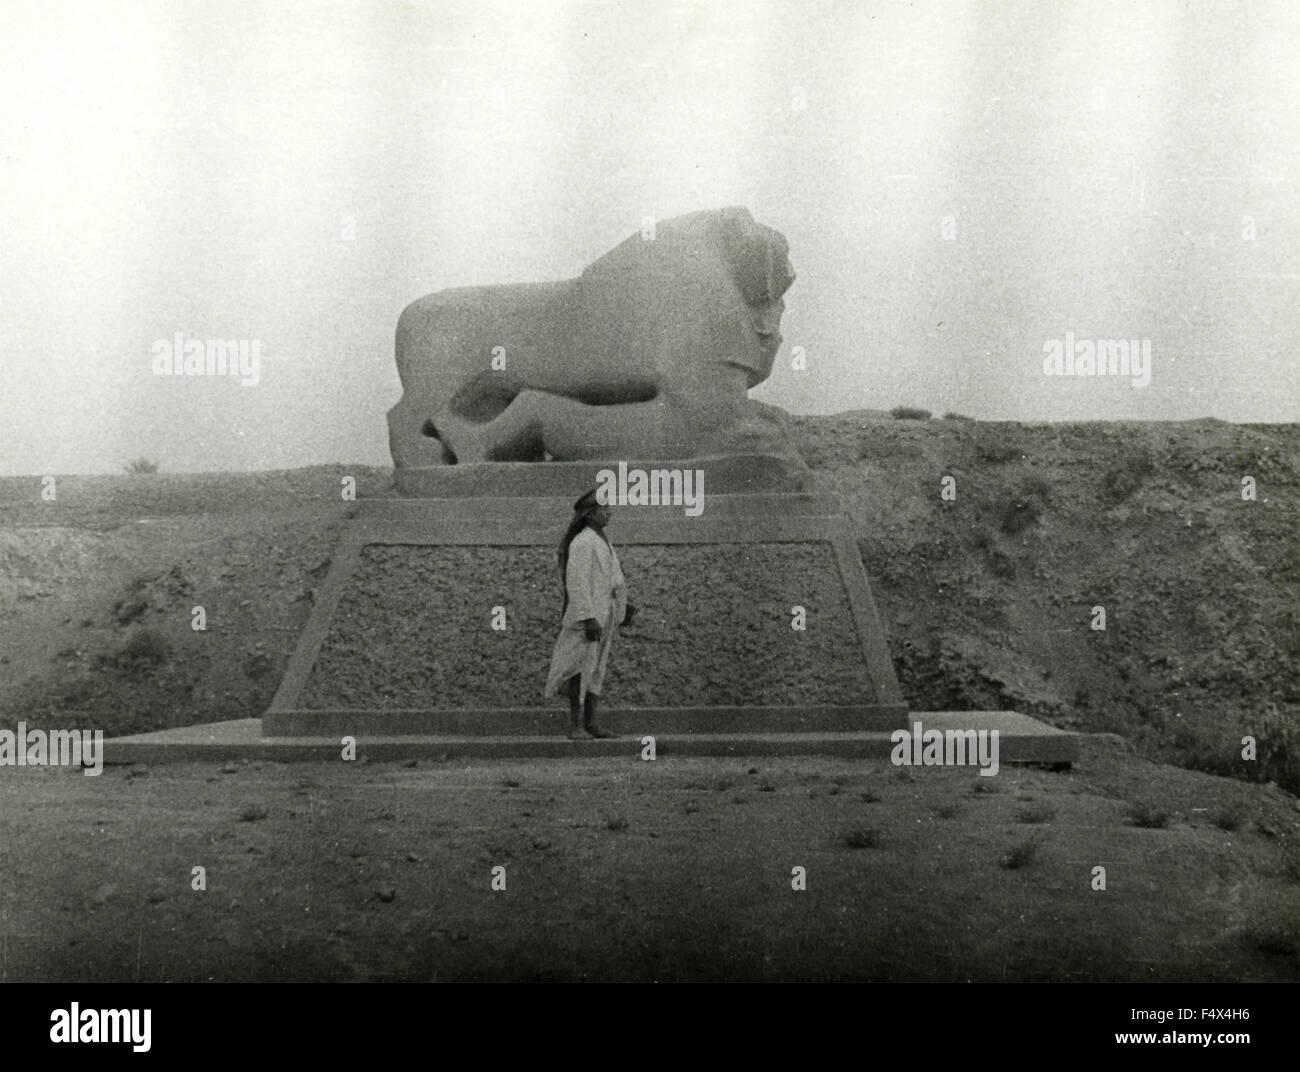 The Lion of Babylon, Iraq Stock Photo